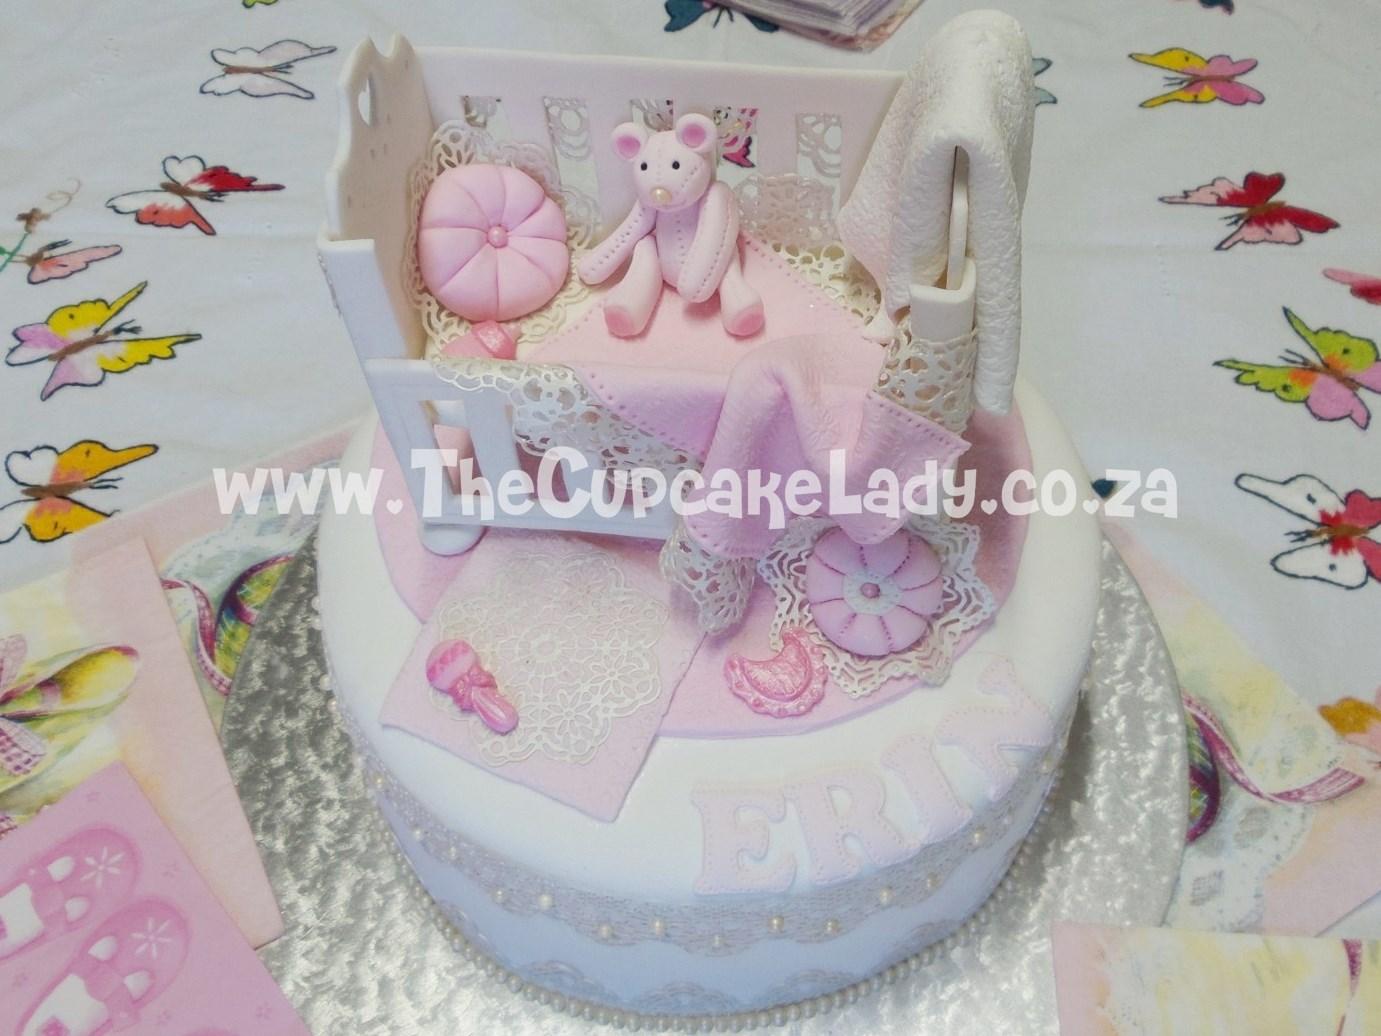 baby shower, baby girl, cake, sugar paste cot, sugar paste pillows, sugar paste blankets, edible lace, pearls